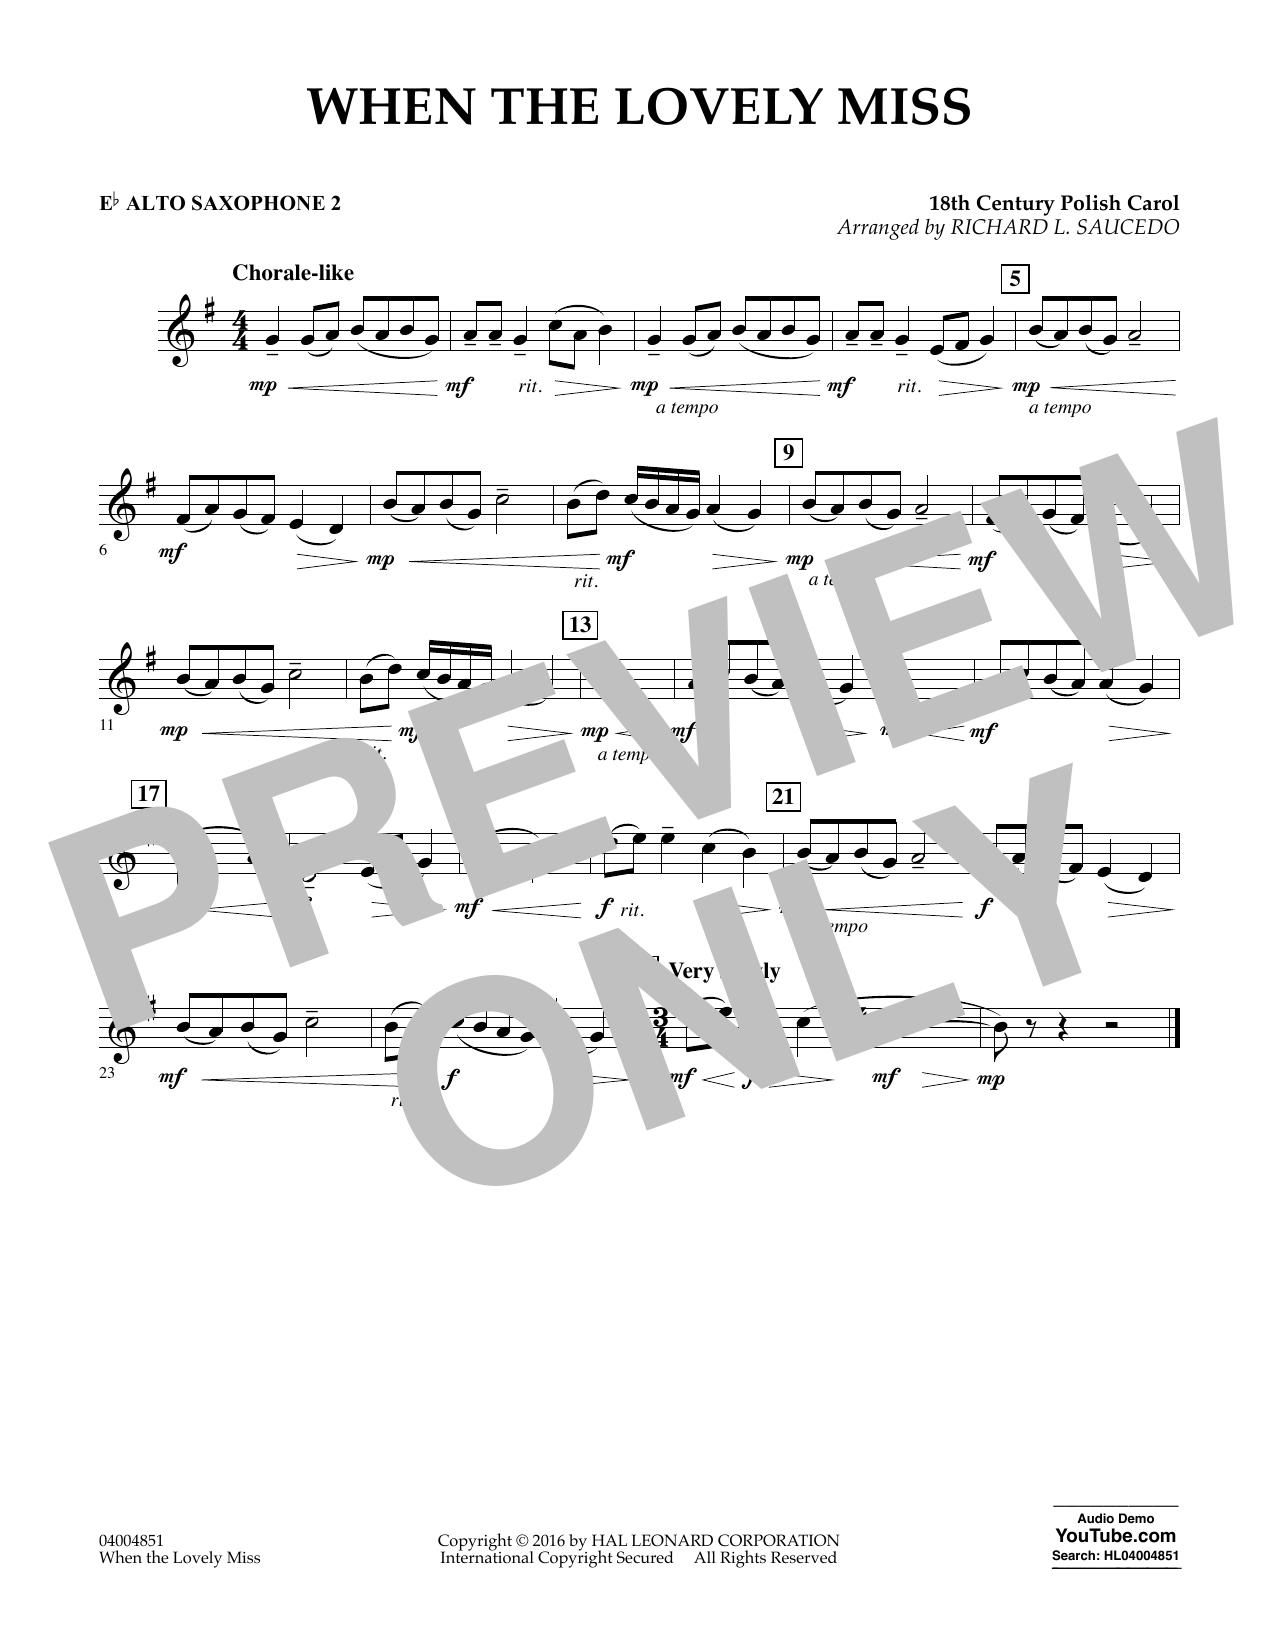 When the Lovely Miss (18th Century Polish Carol) - Eb Alto Saxophone 2